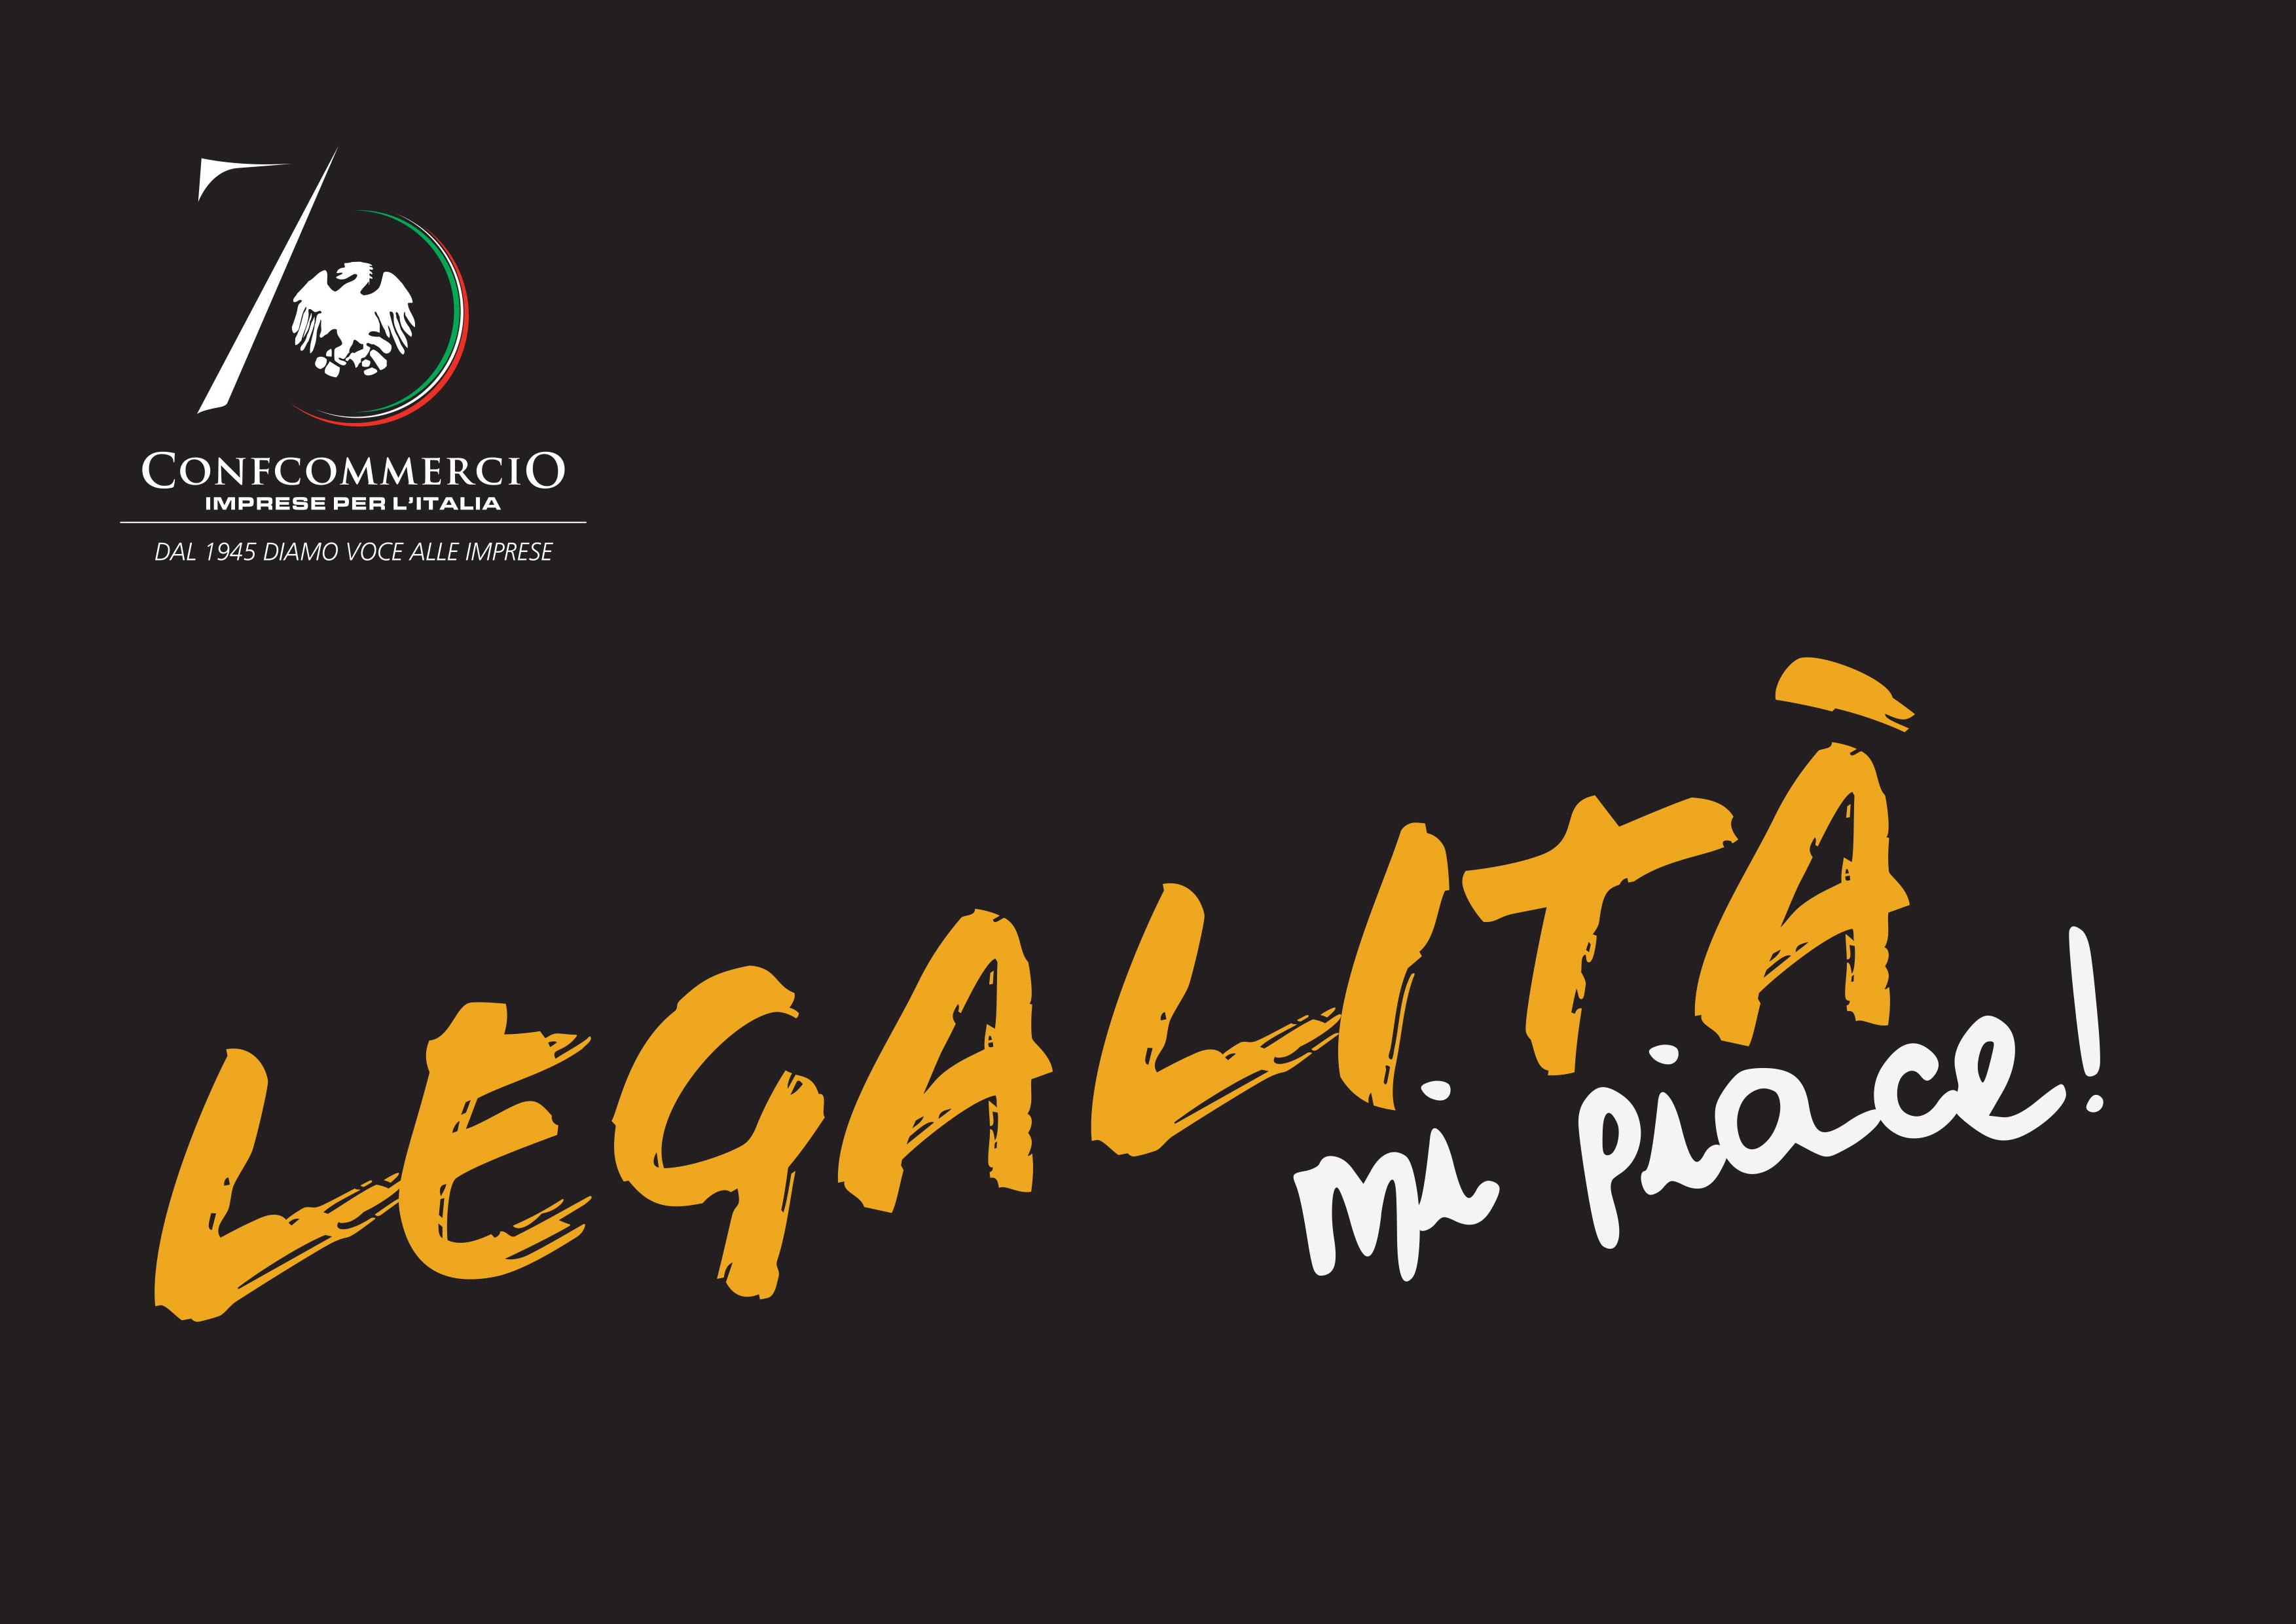 legalita2016_logo-fondo-nero